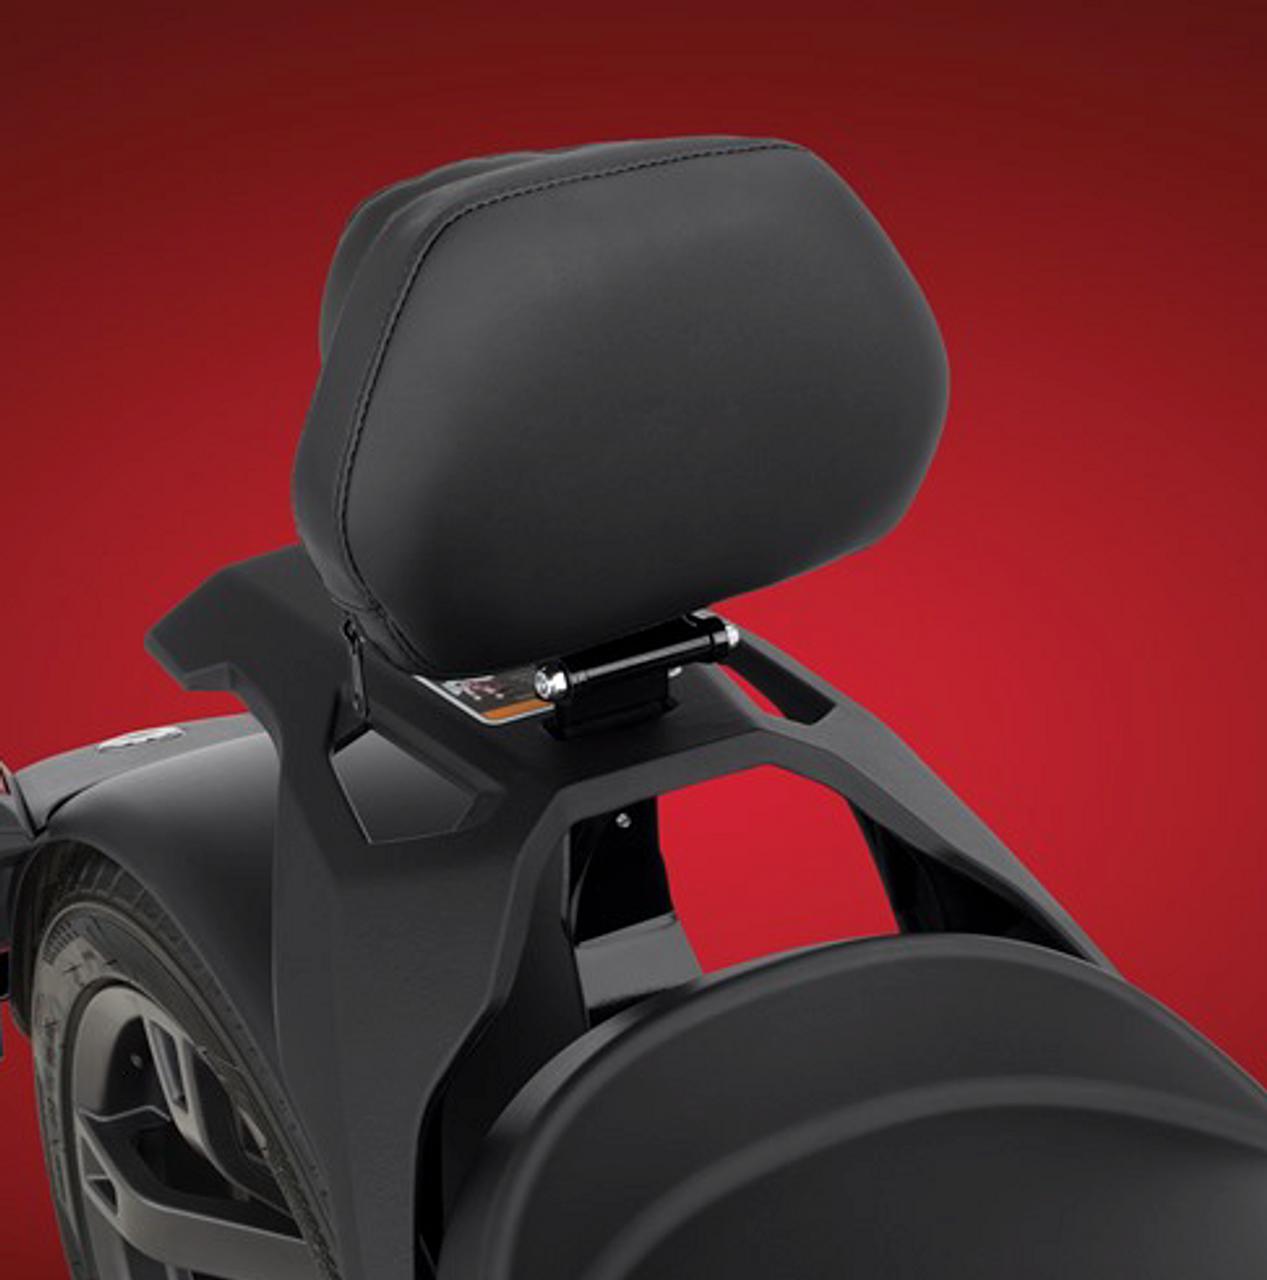 Ryker - Quick detach Rider backrest